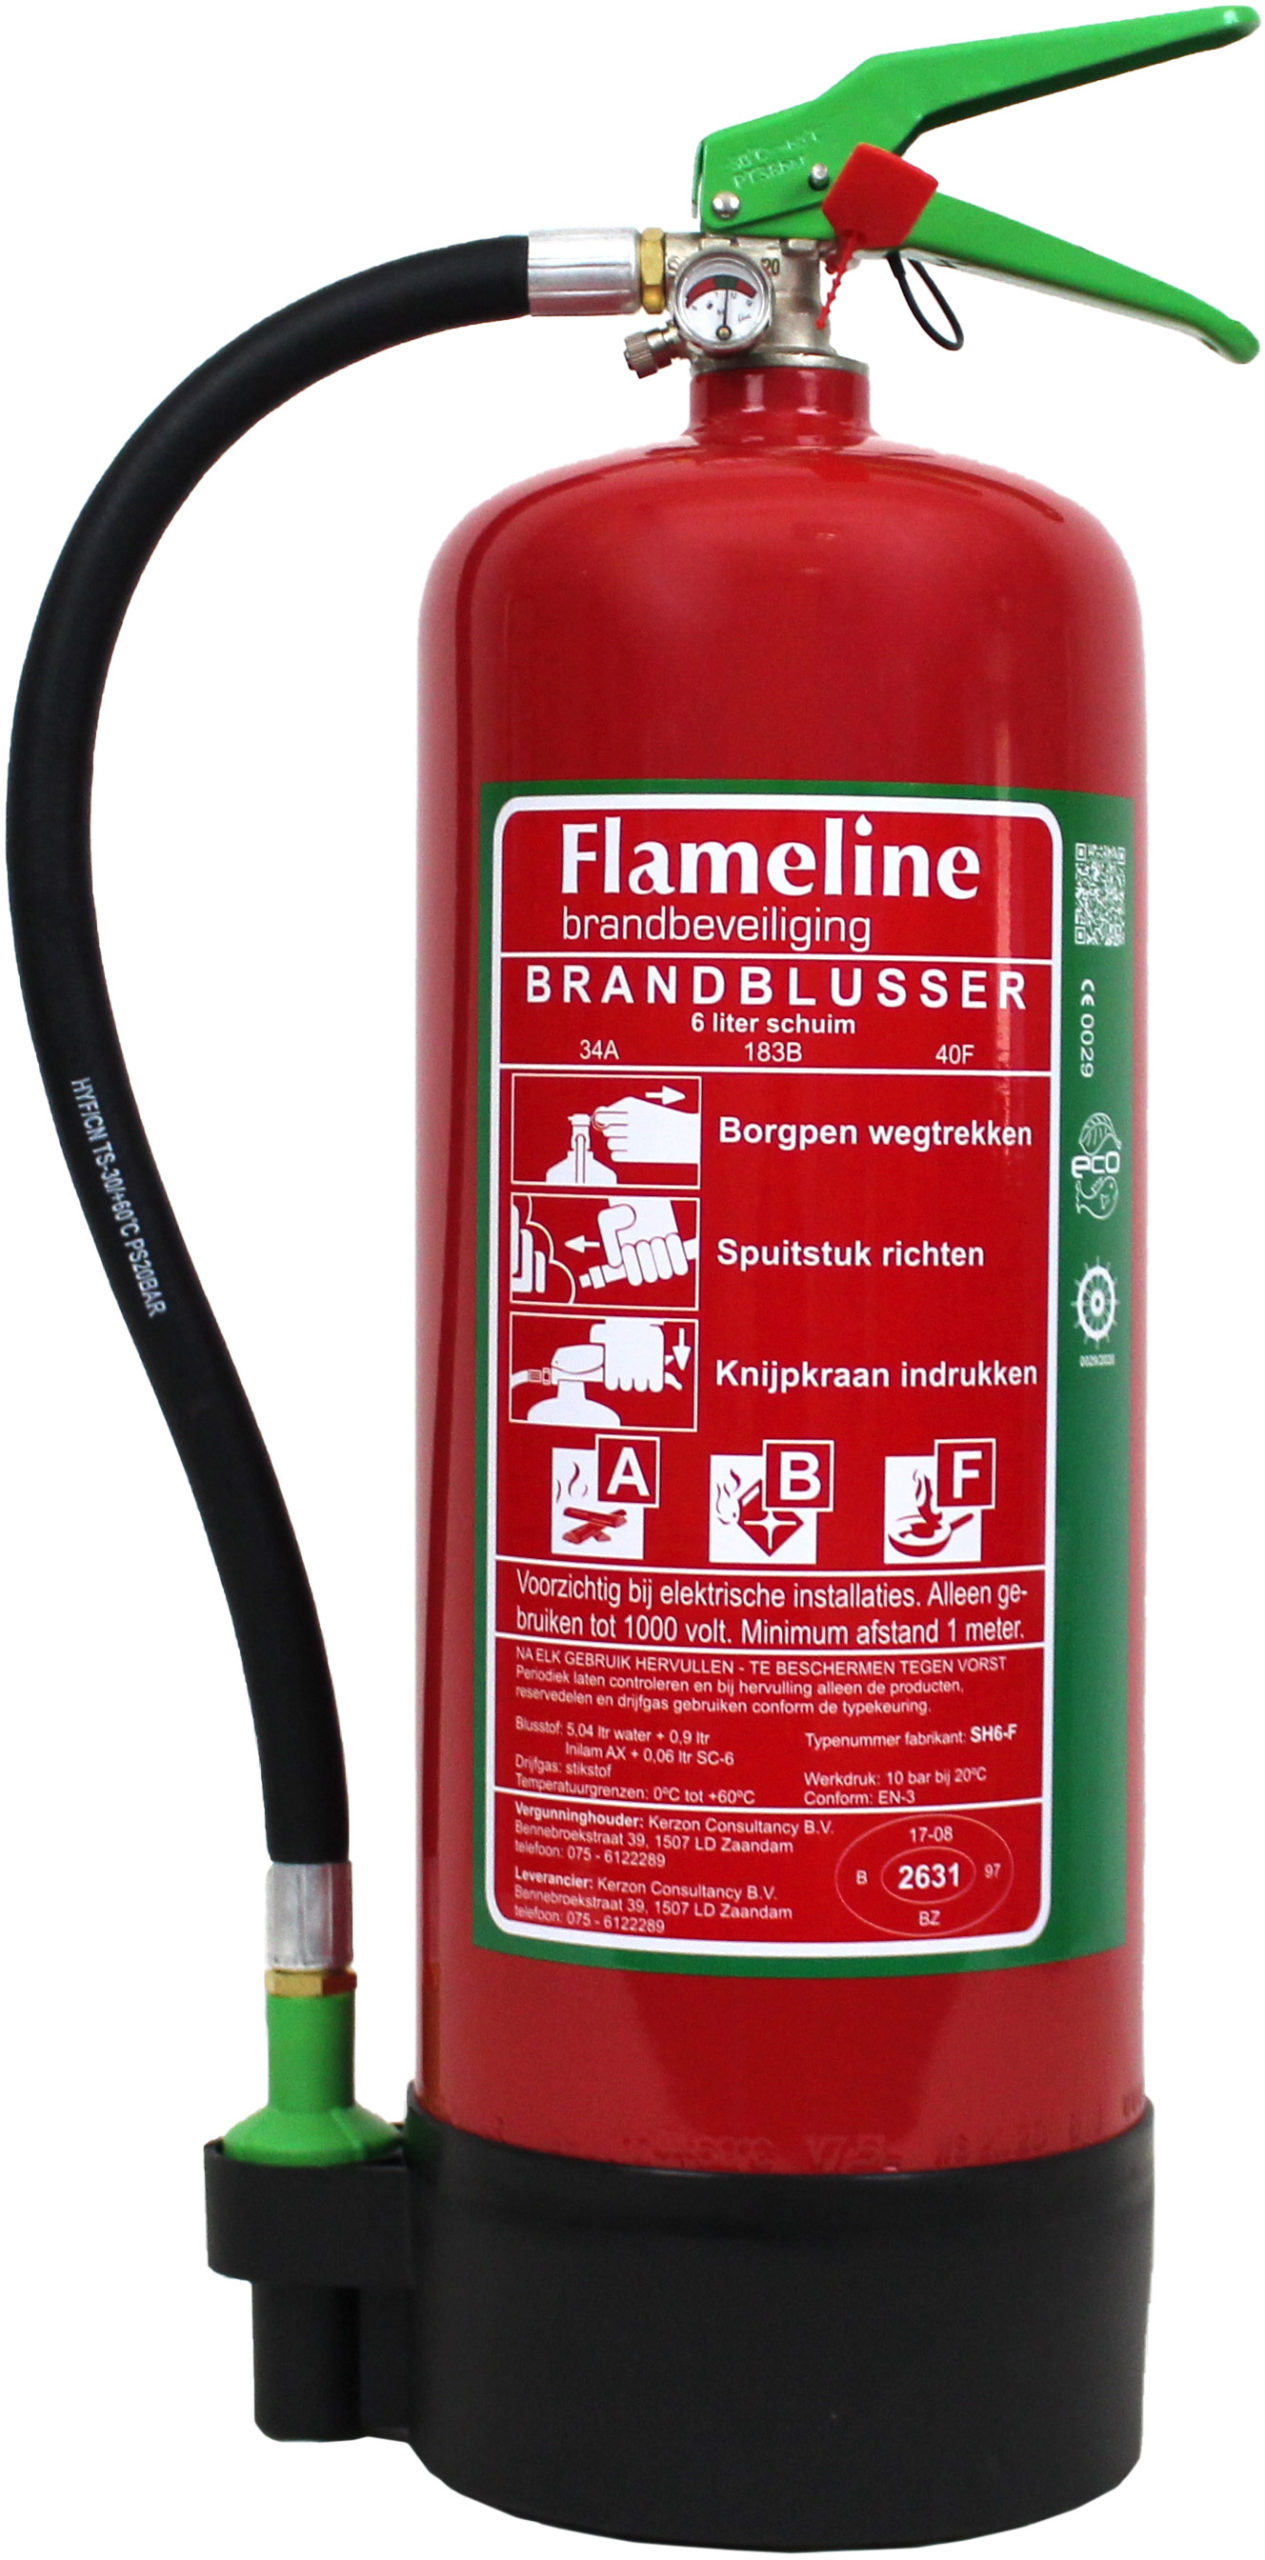 SH6F schuimblustoestel +vet blustoestel  6 liter rating 34A-183B-40F